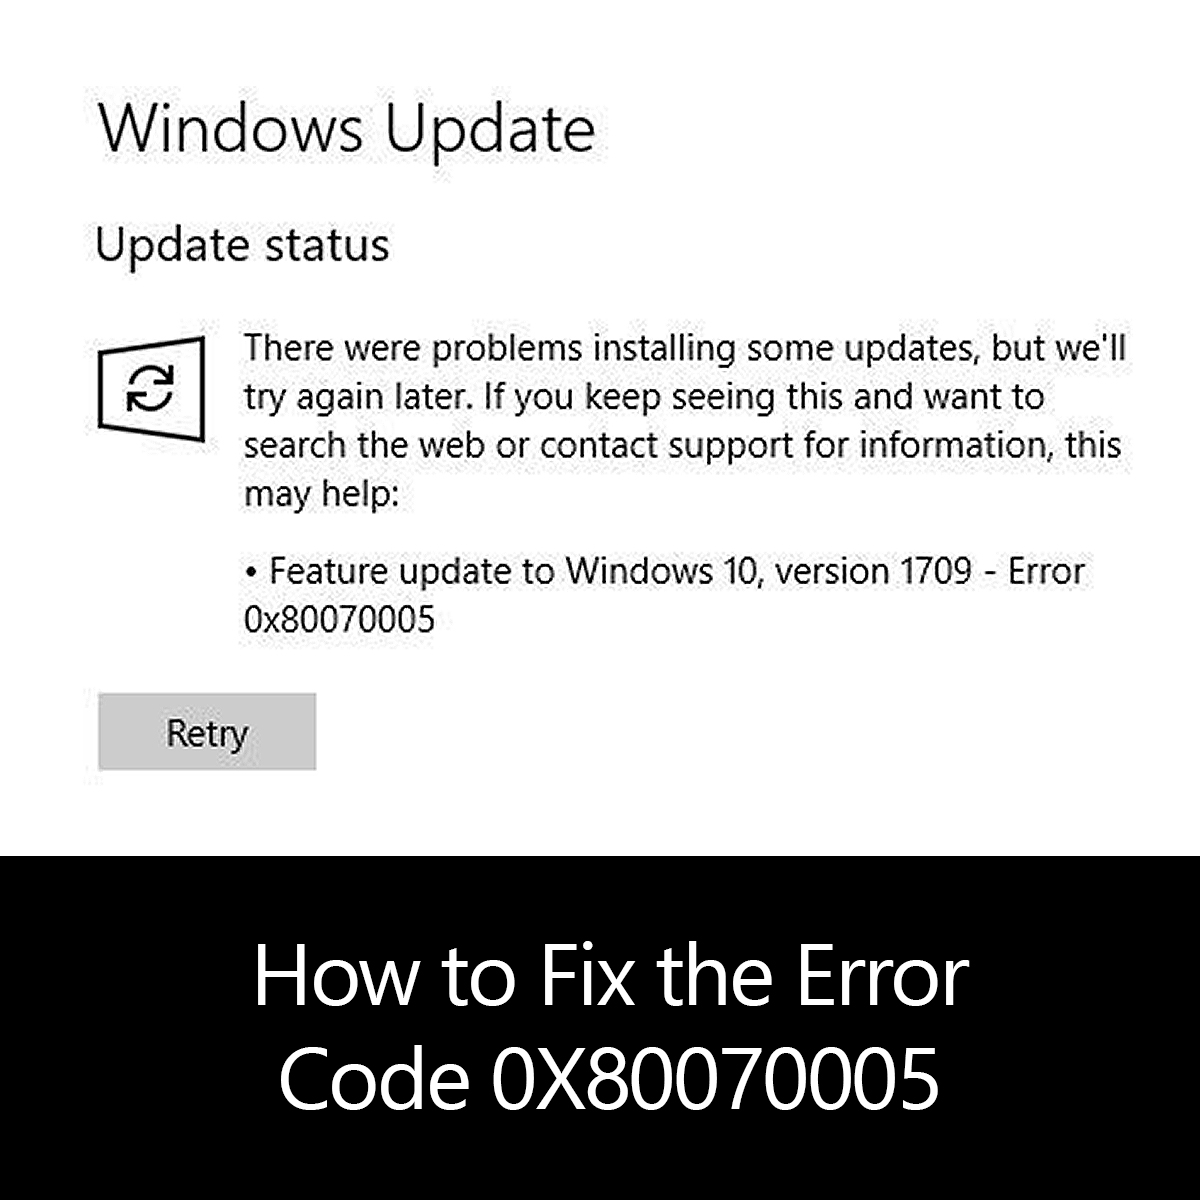 How to Fix the Error Code 0X80070005